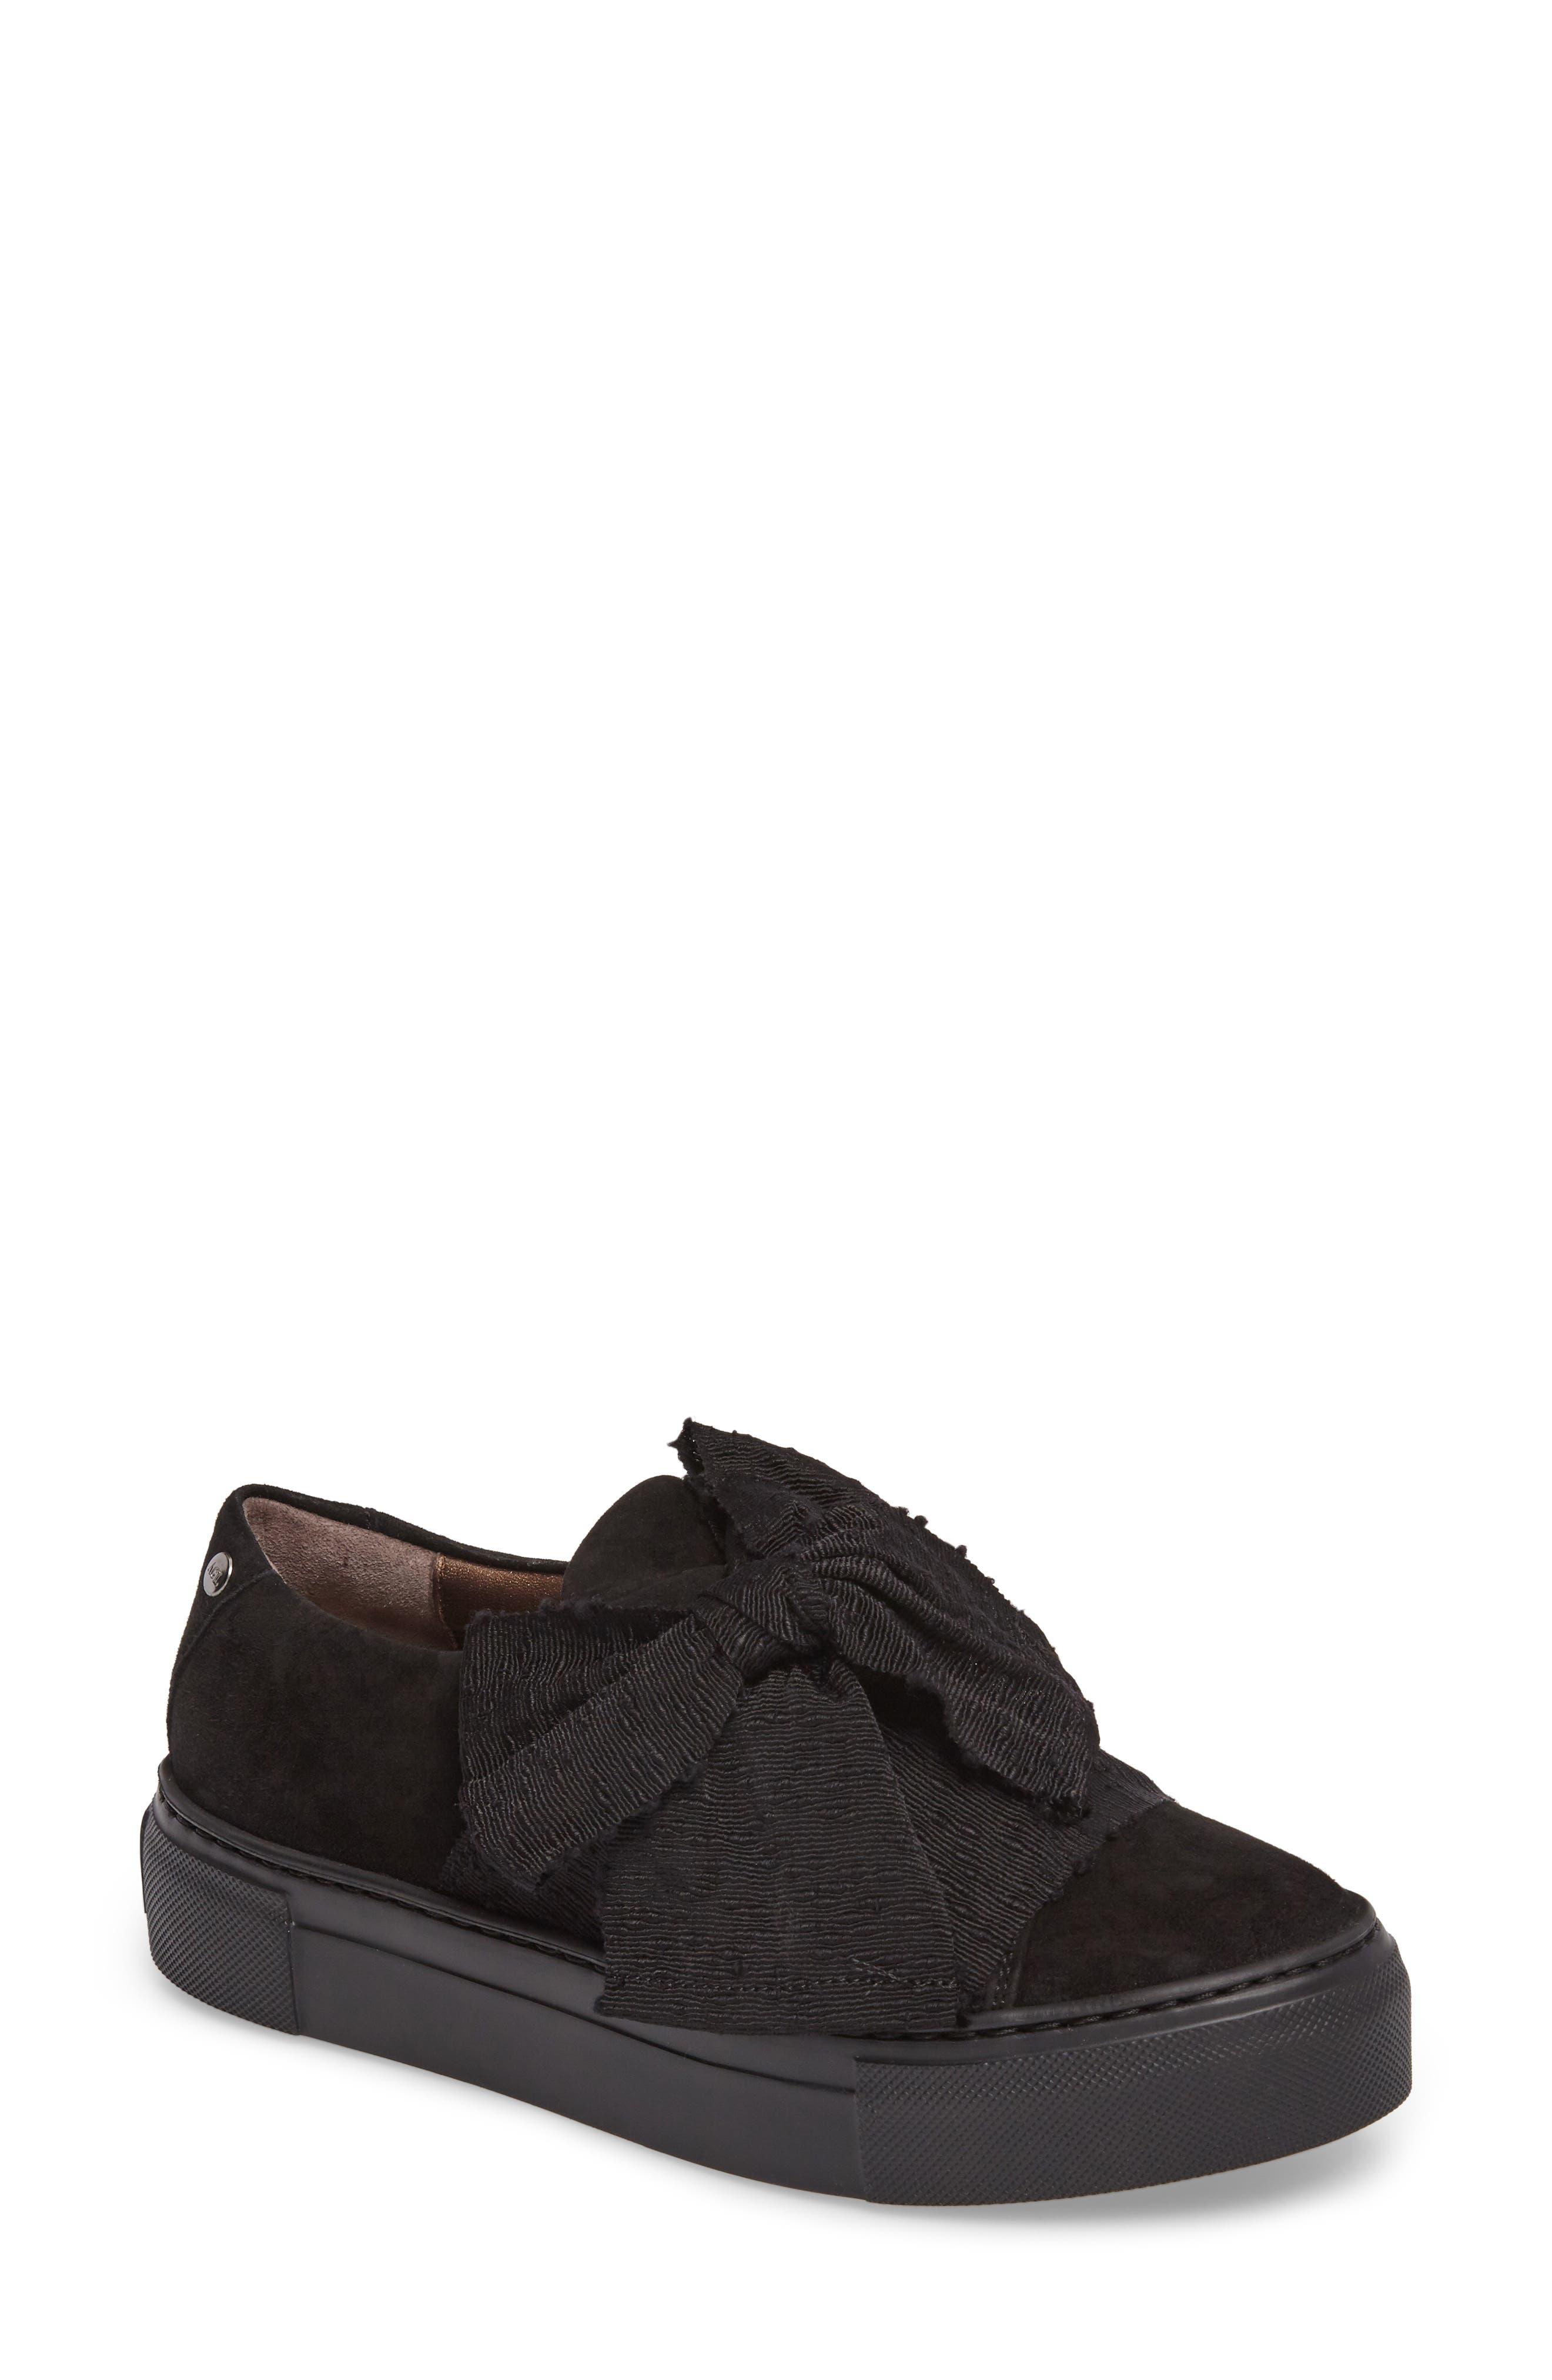 Main Image - AGL Bow Platform Sneaker (Women)